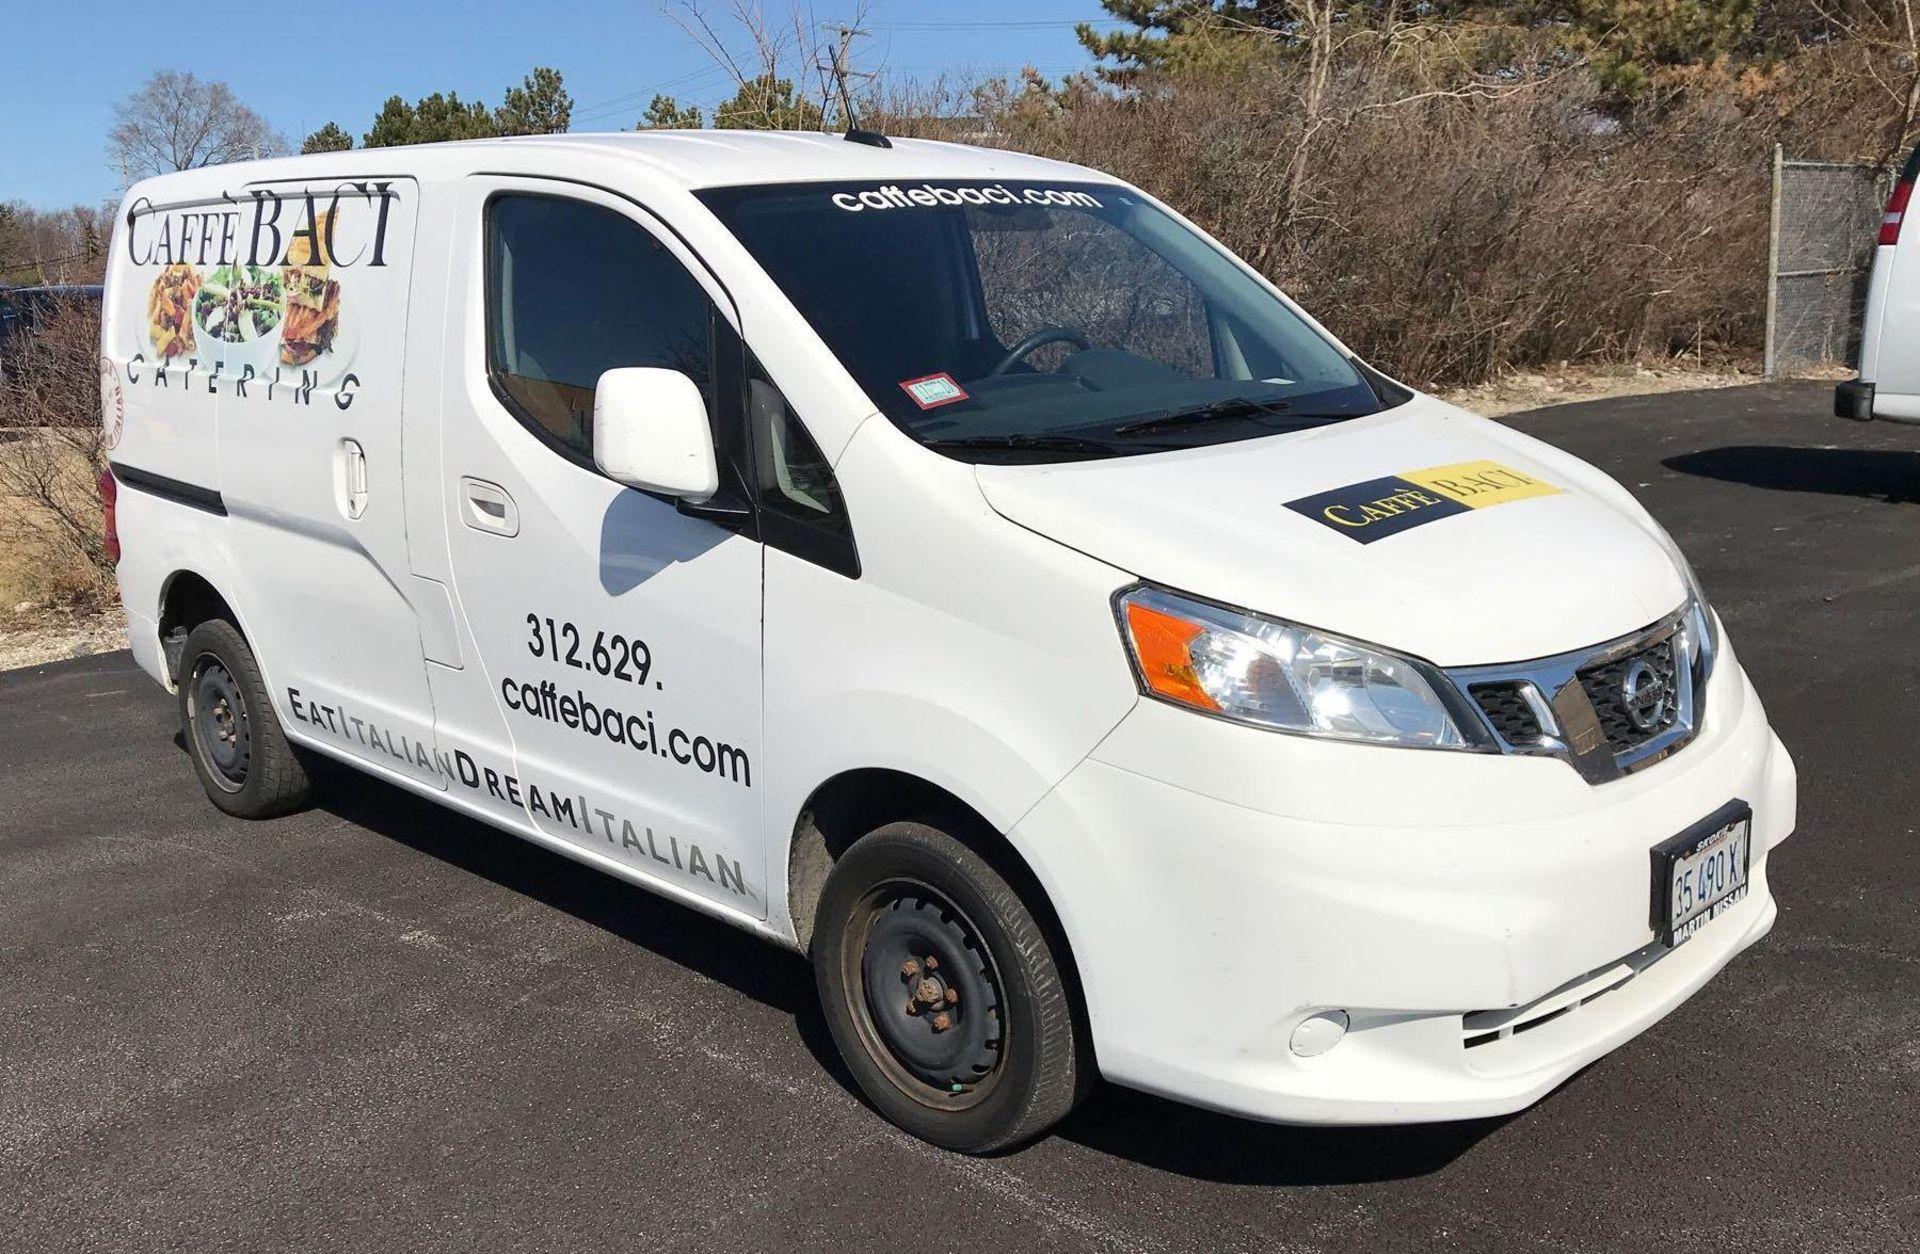 2013 Nissan NV200 Delivery Van - Image 3 of 54